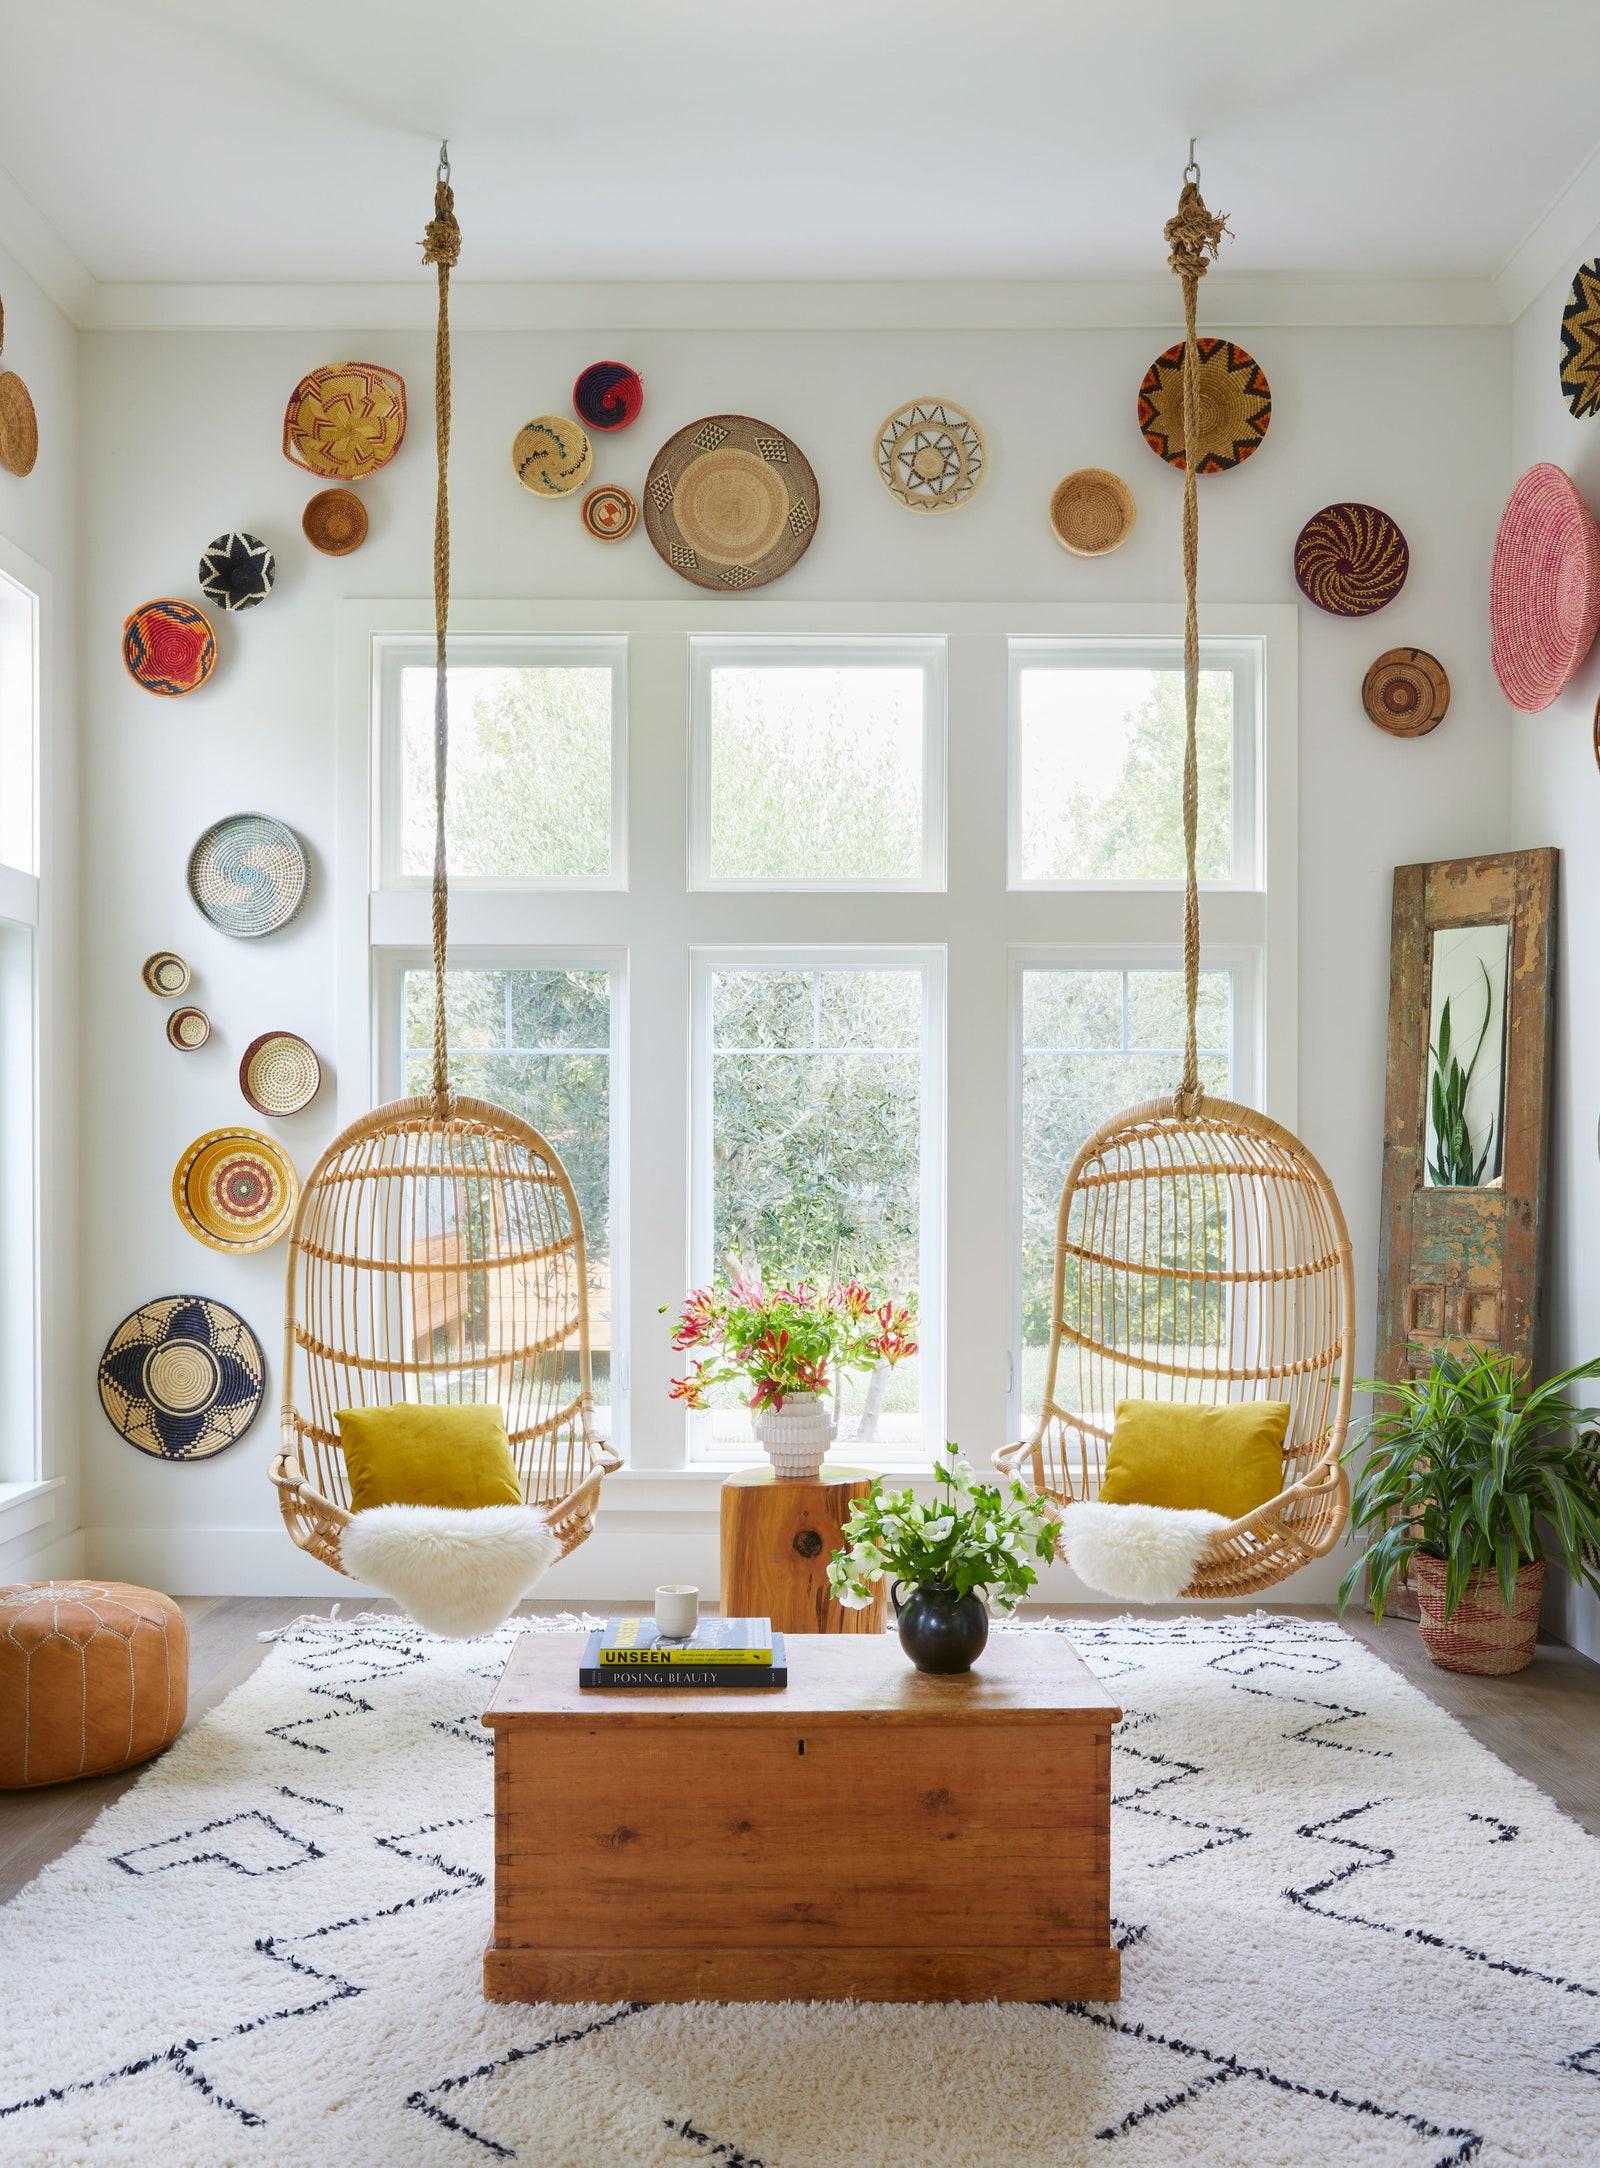 Ideia Decorar 21 ideias para decorar paredes 21 ideias para decorar paredes 14